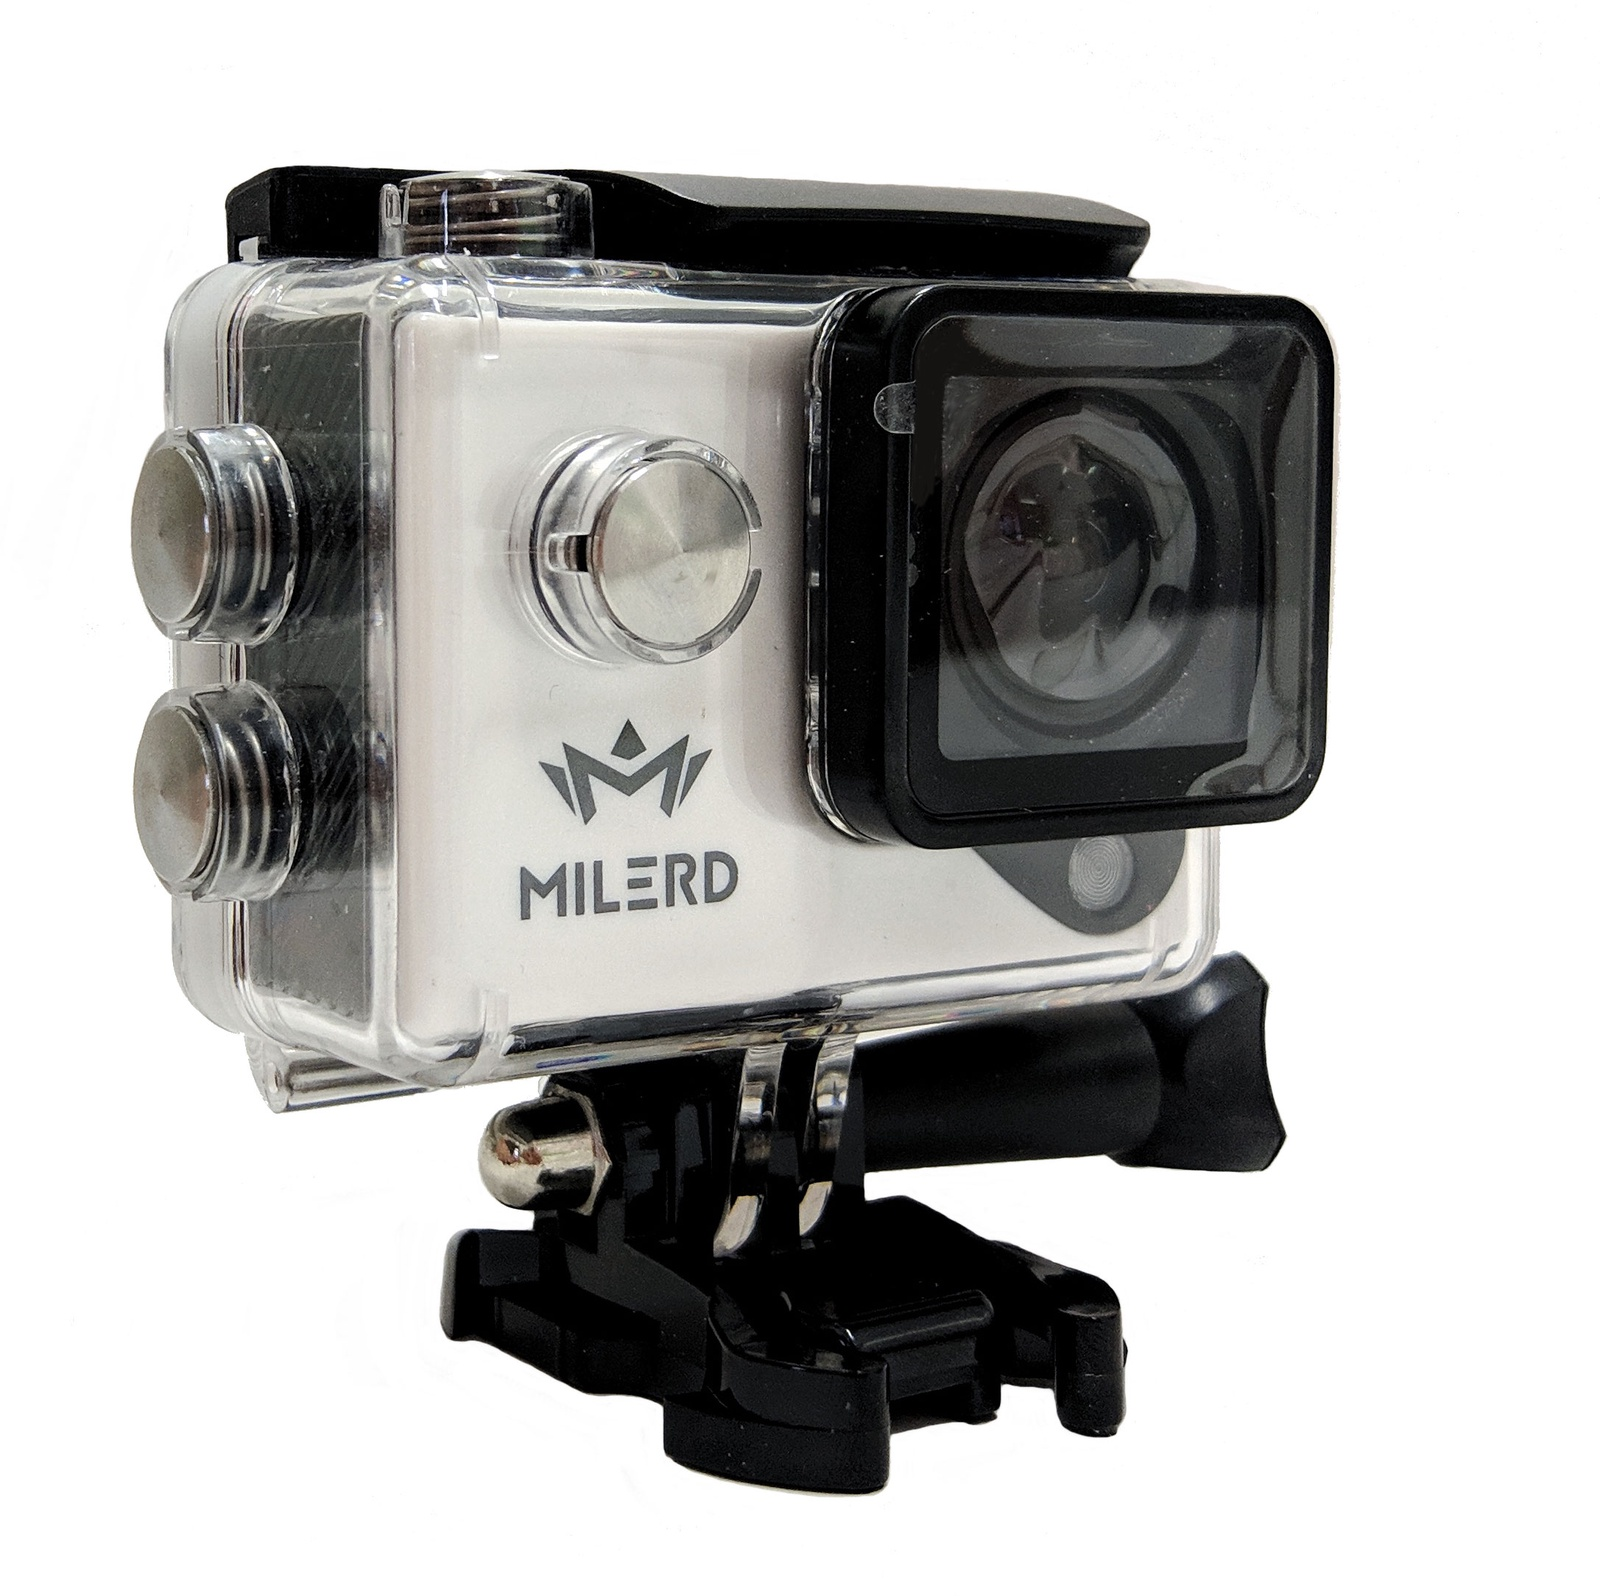 Экшн-камера MILERD FOTEX D400 Ultra HD 4K, белый, черный экшн камера palmexx 4k wi fi action camera ultrahd black px cam 4k bla